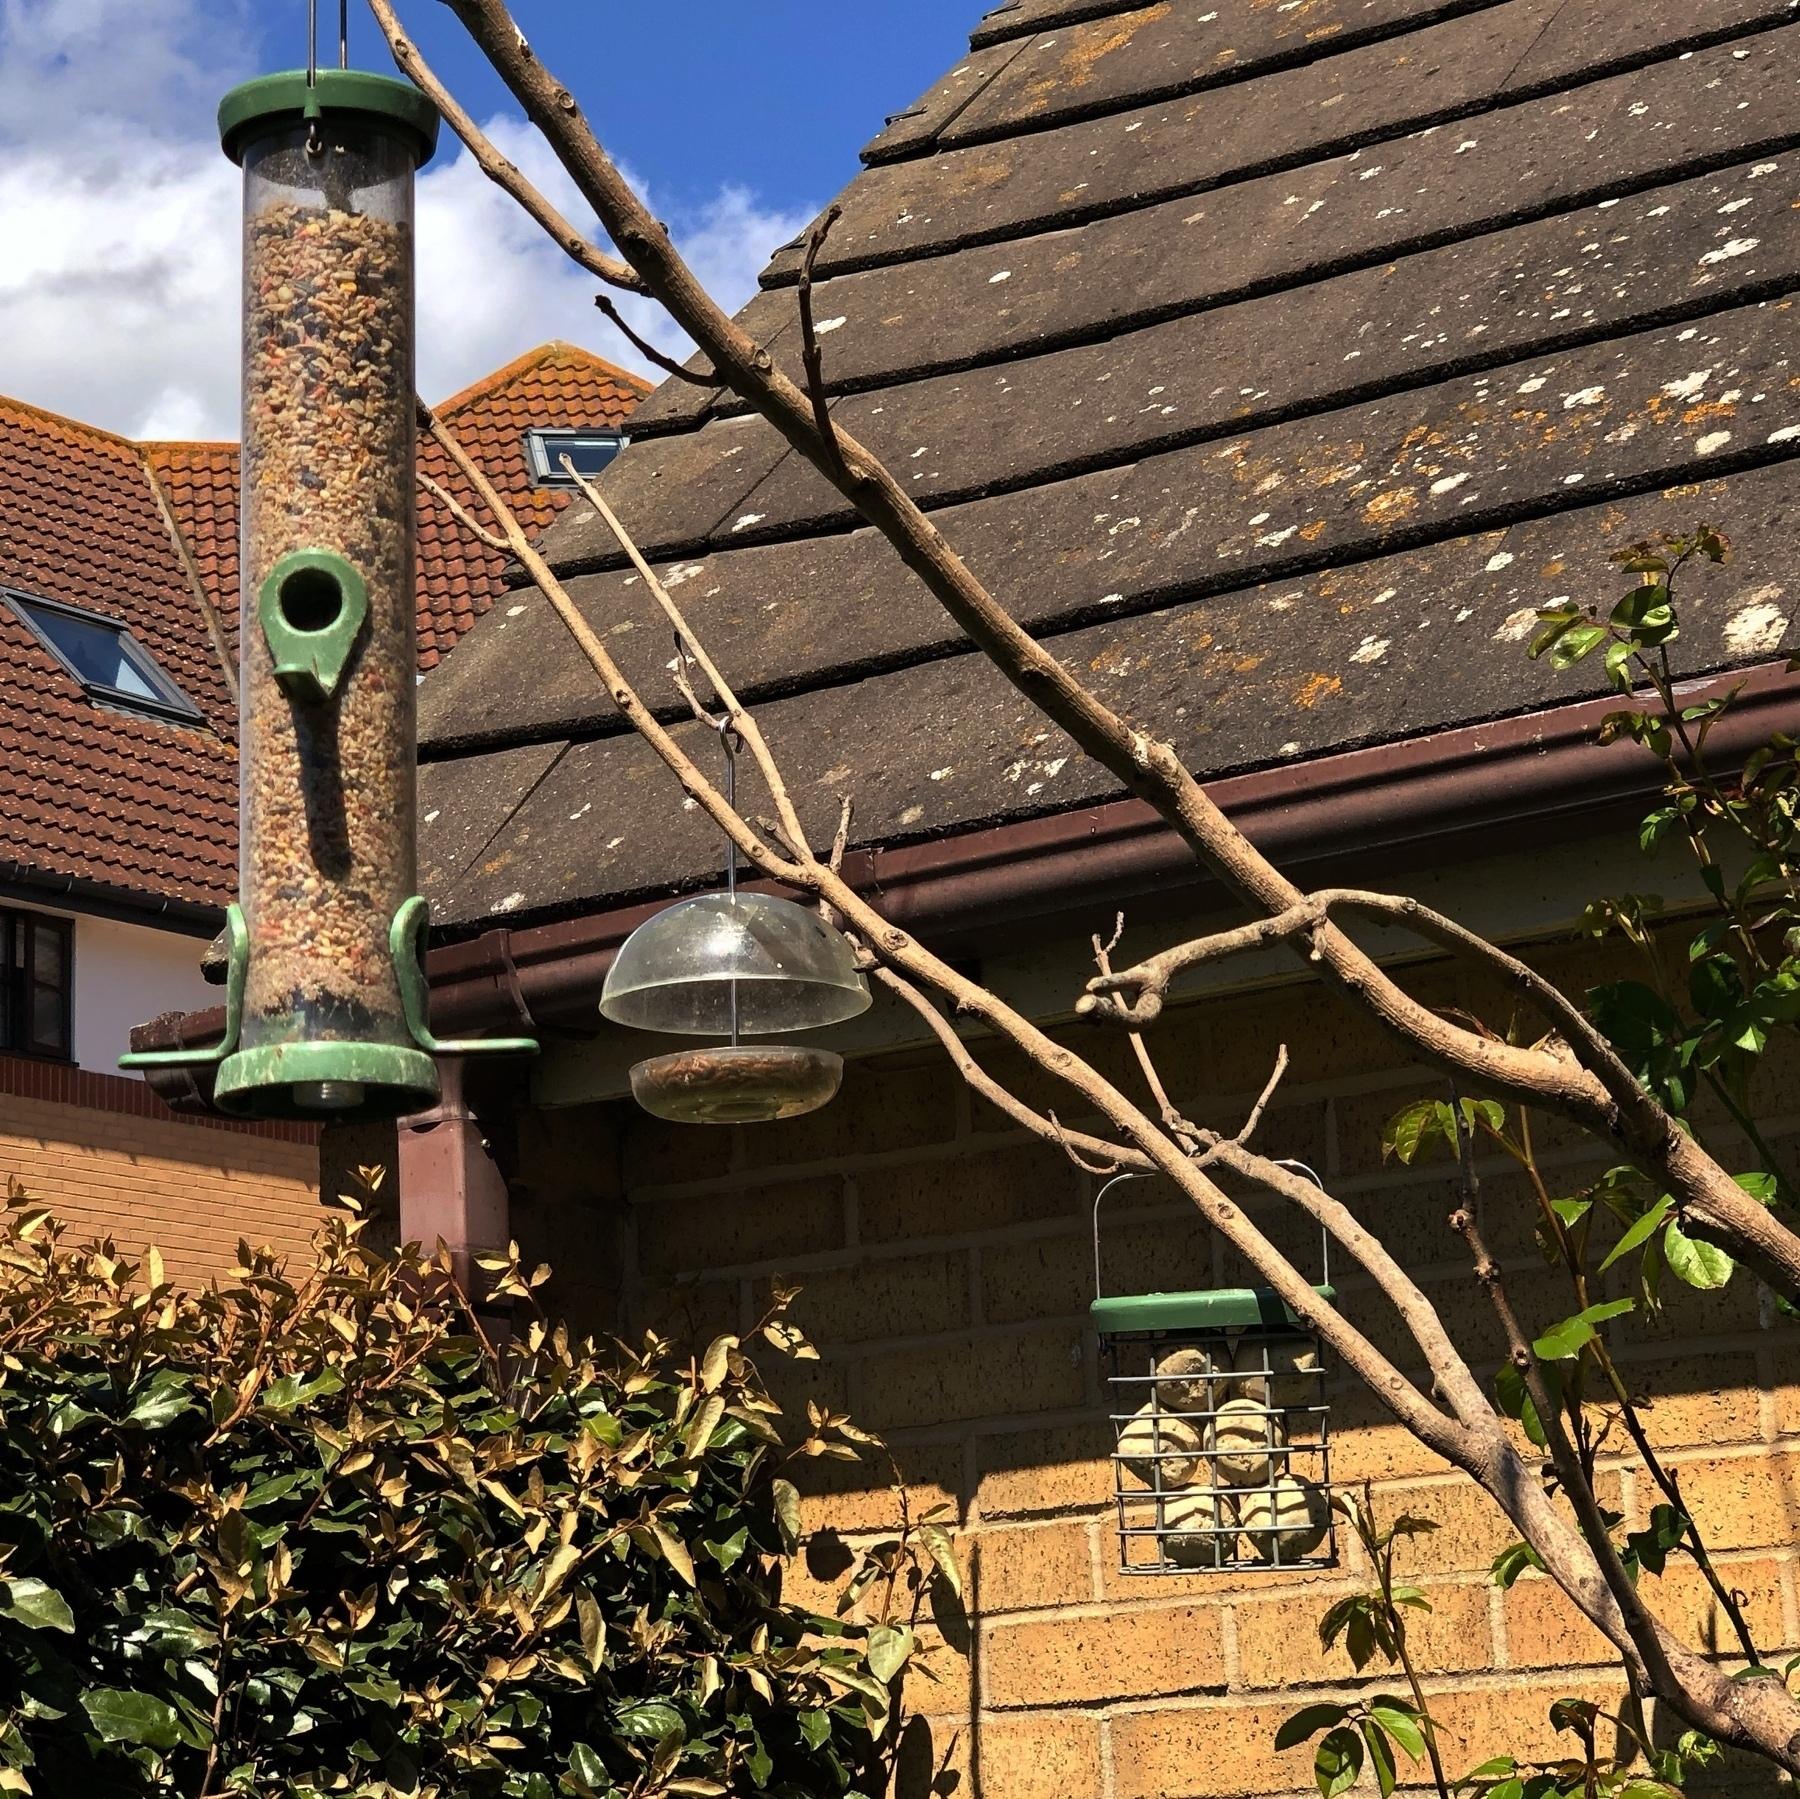 Bird feeders in a back garden.